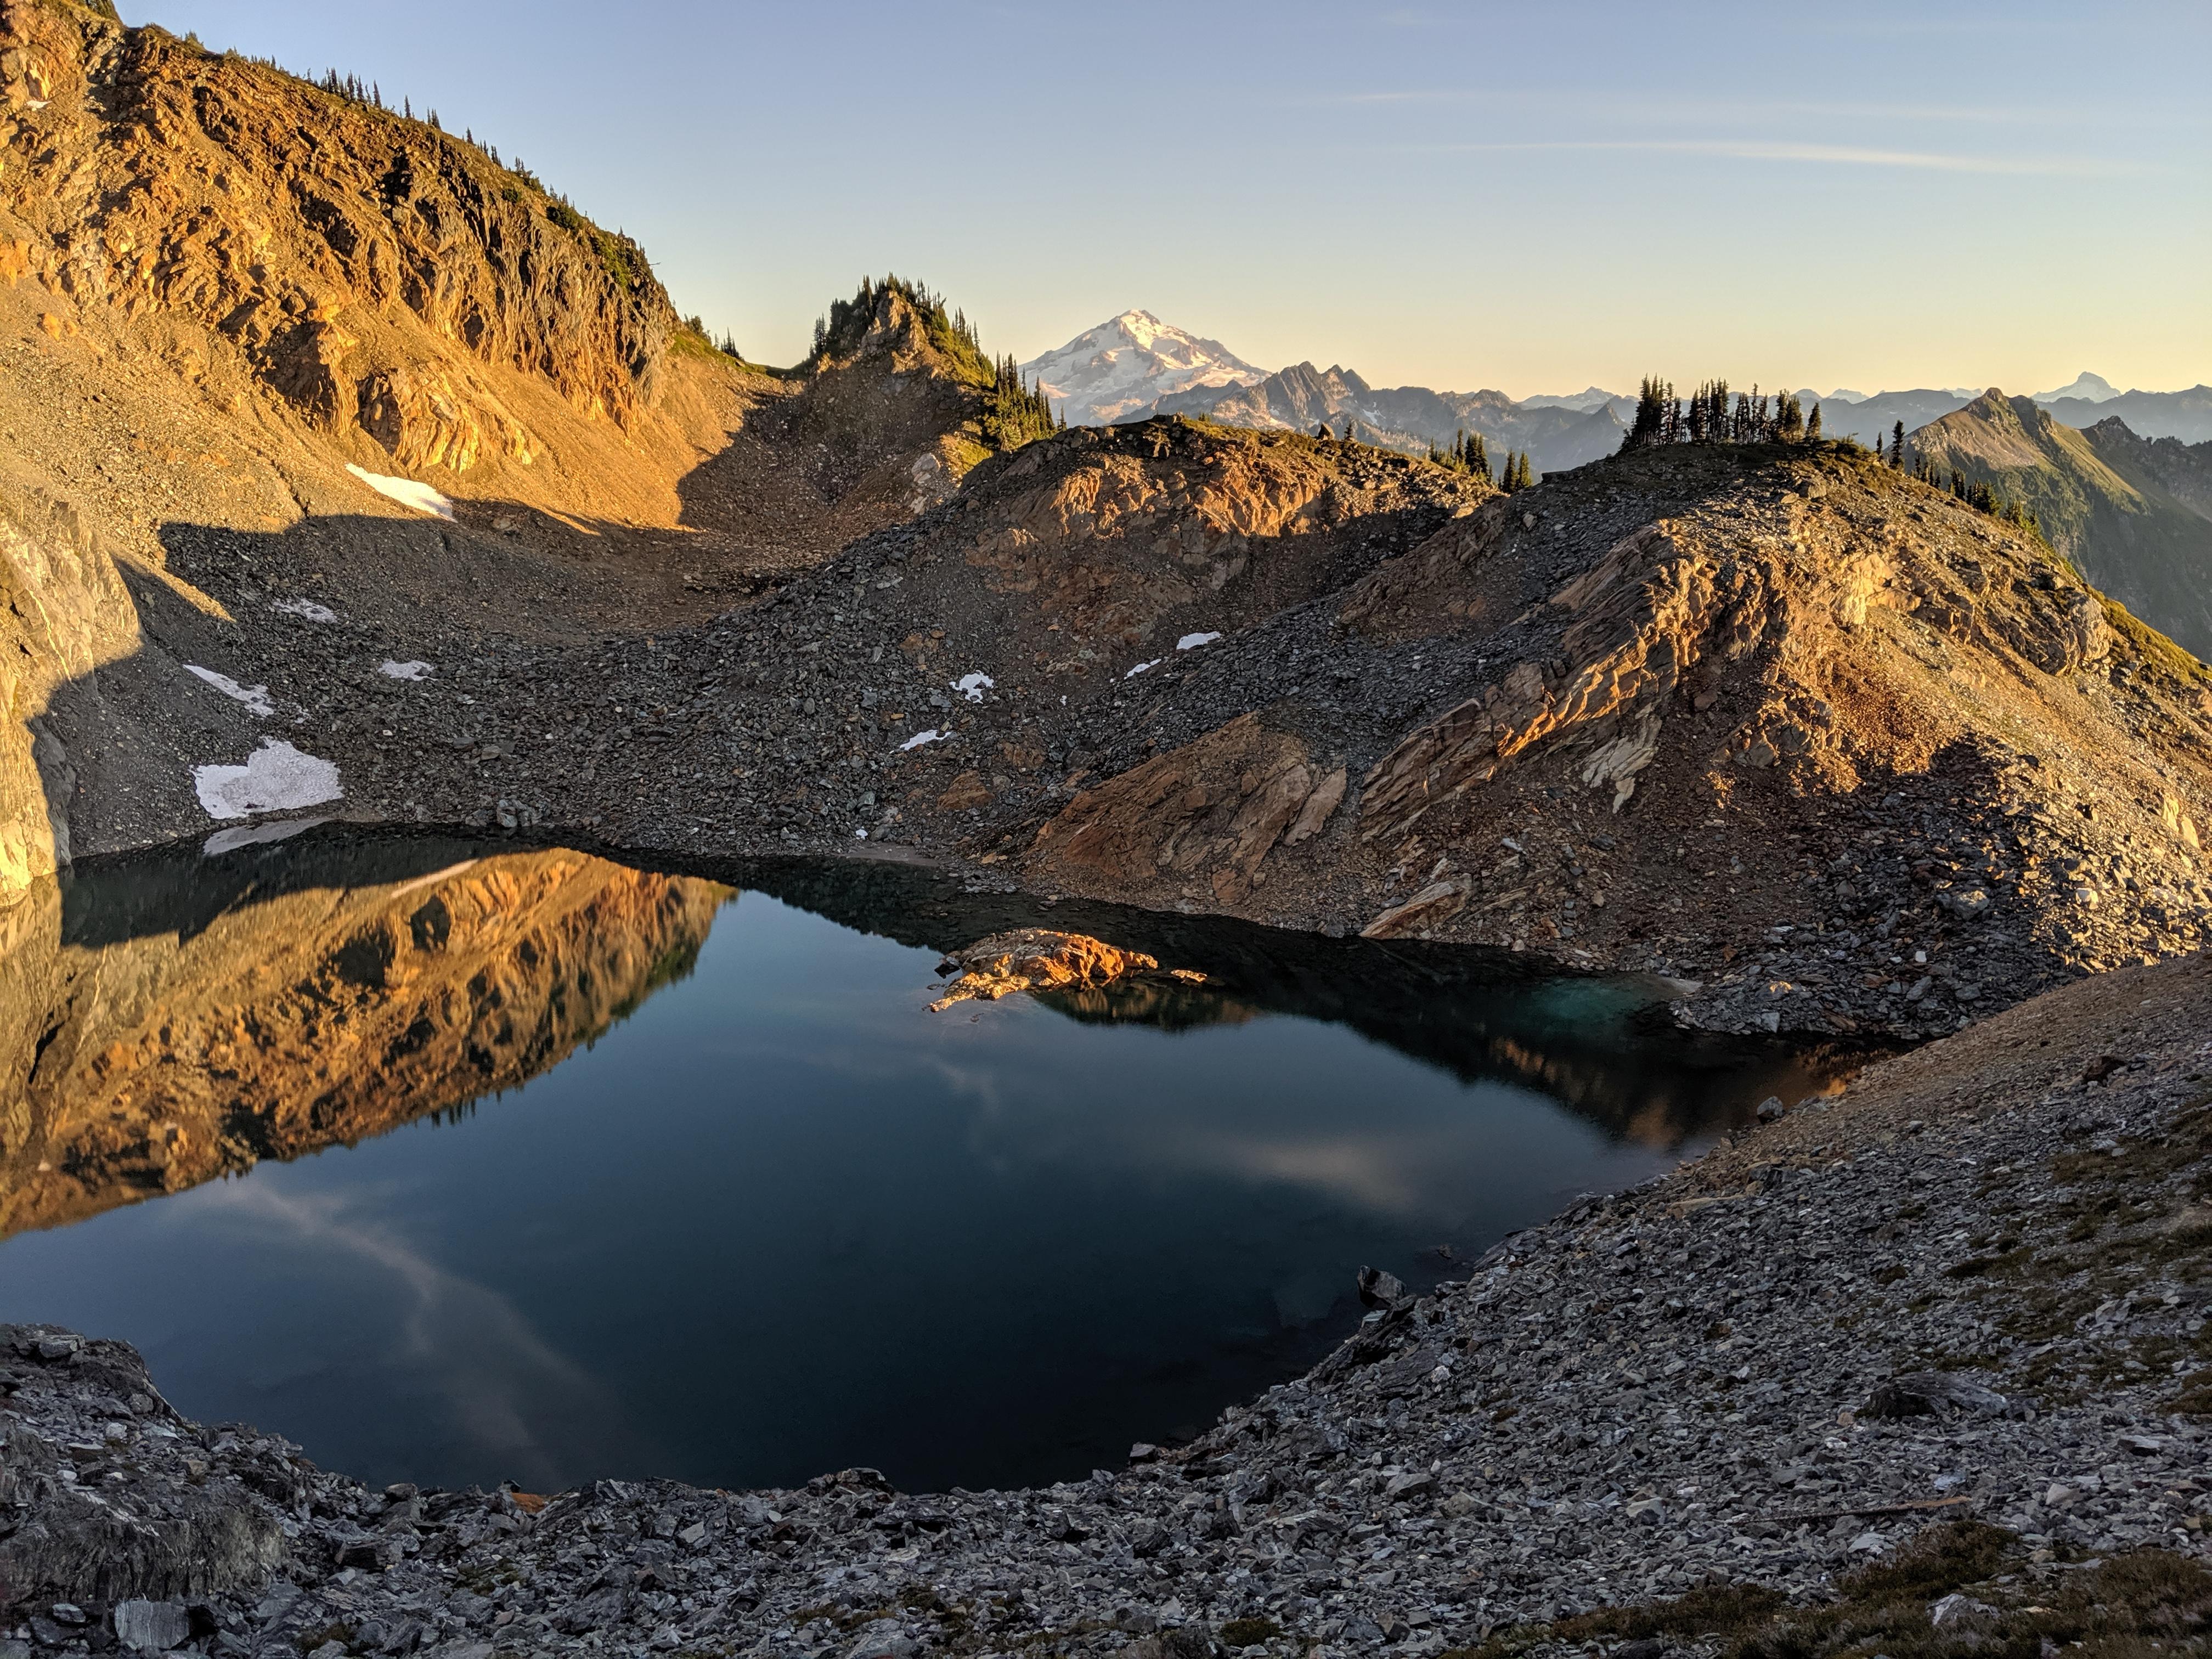 18-Spire-Lake-Jonathan-Claussen